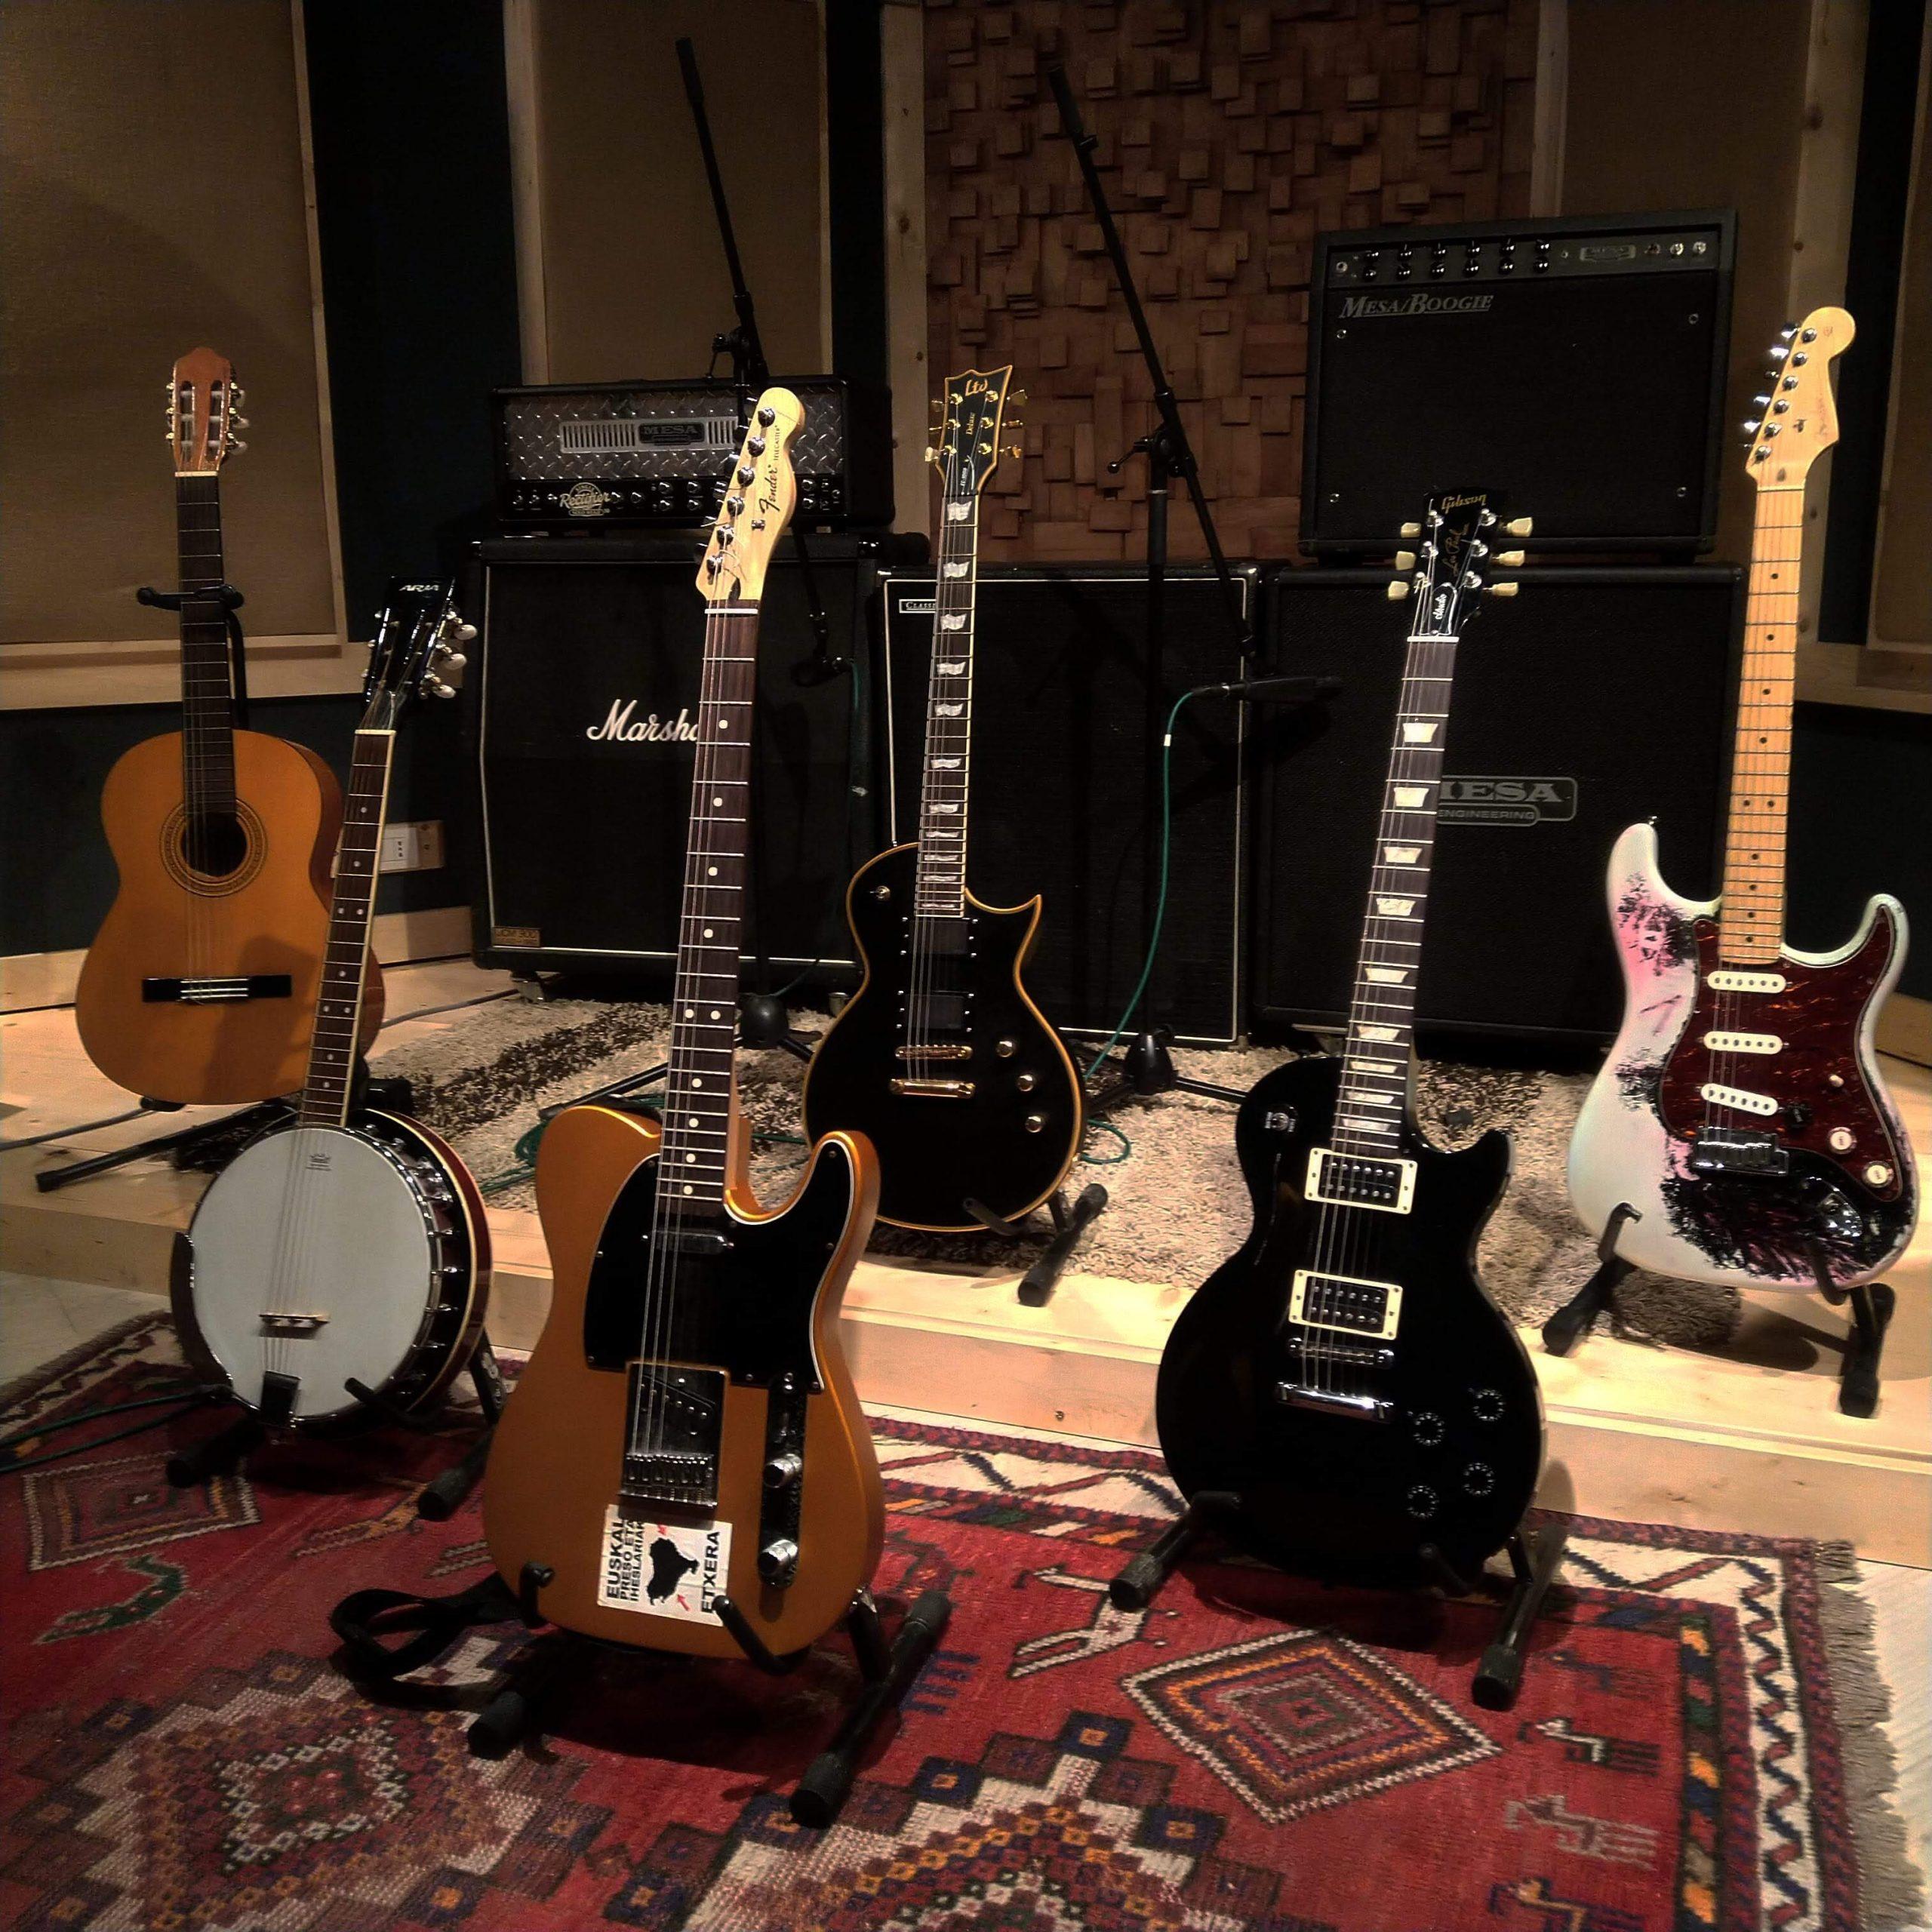 Ivanoska Guitars